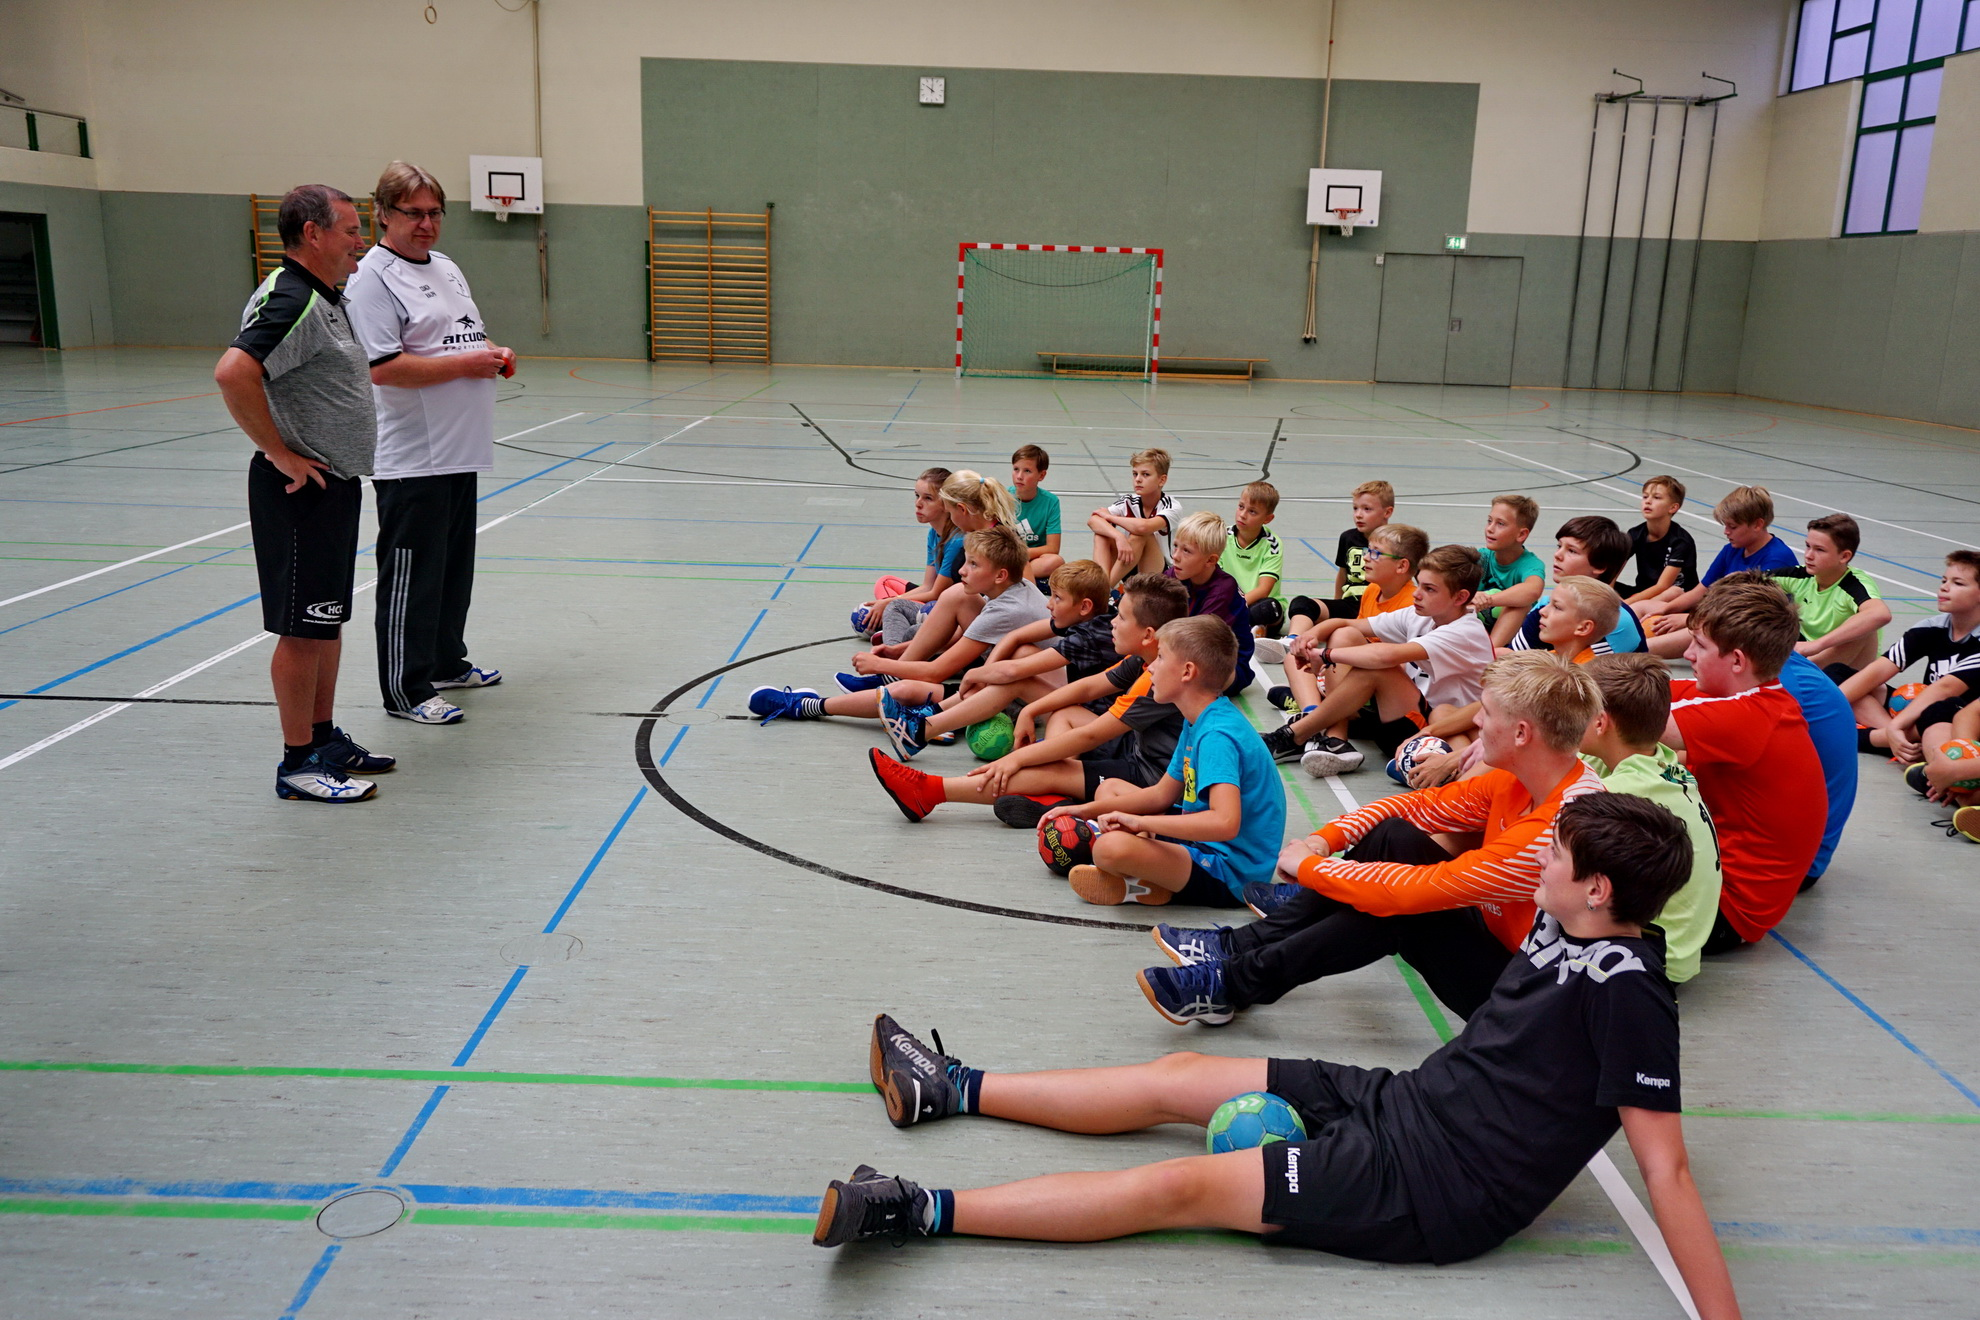 201808_Handballcamp_SDH_MG_005w